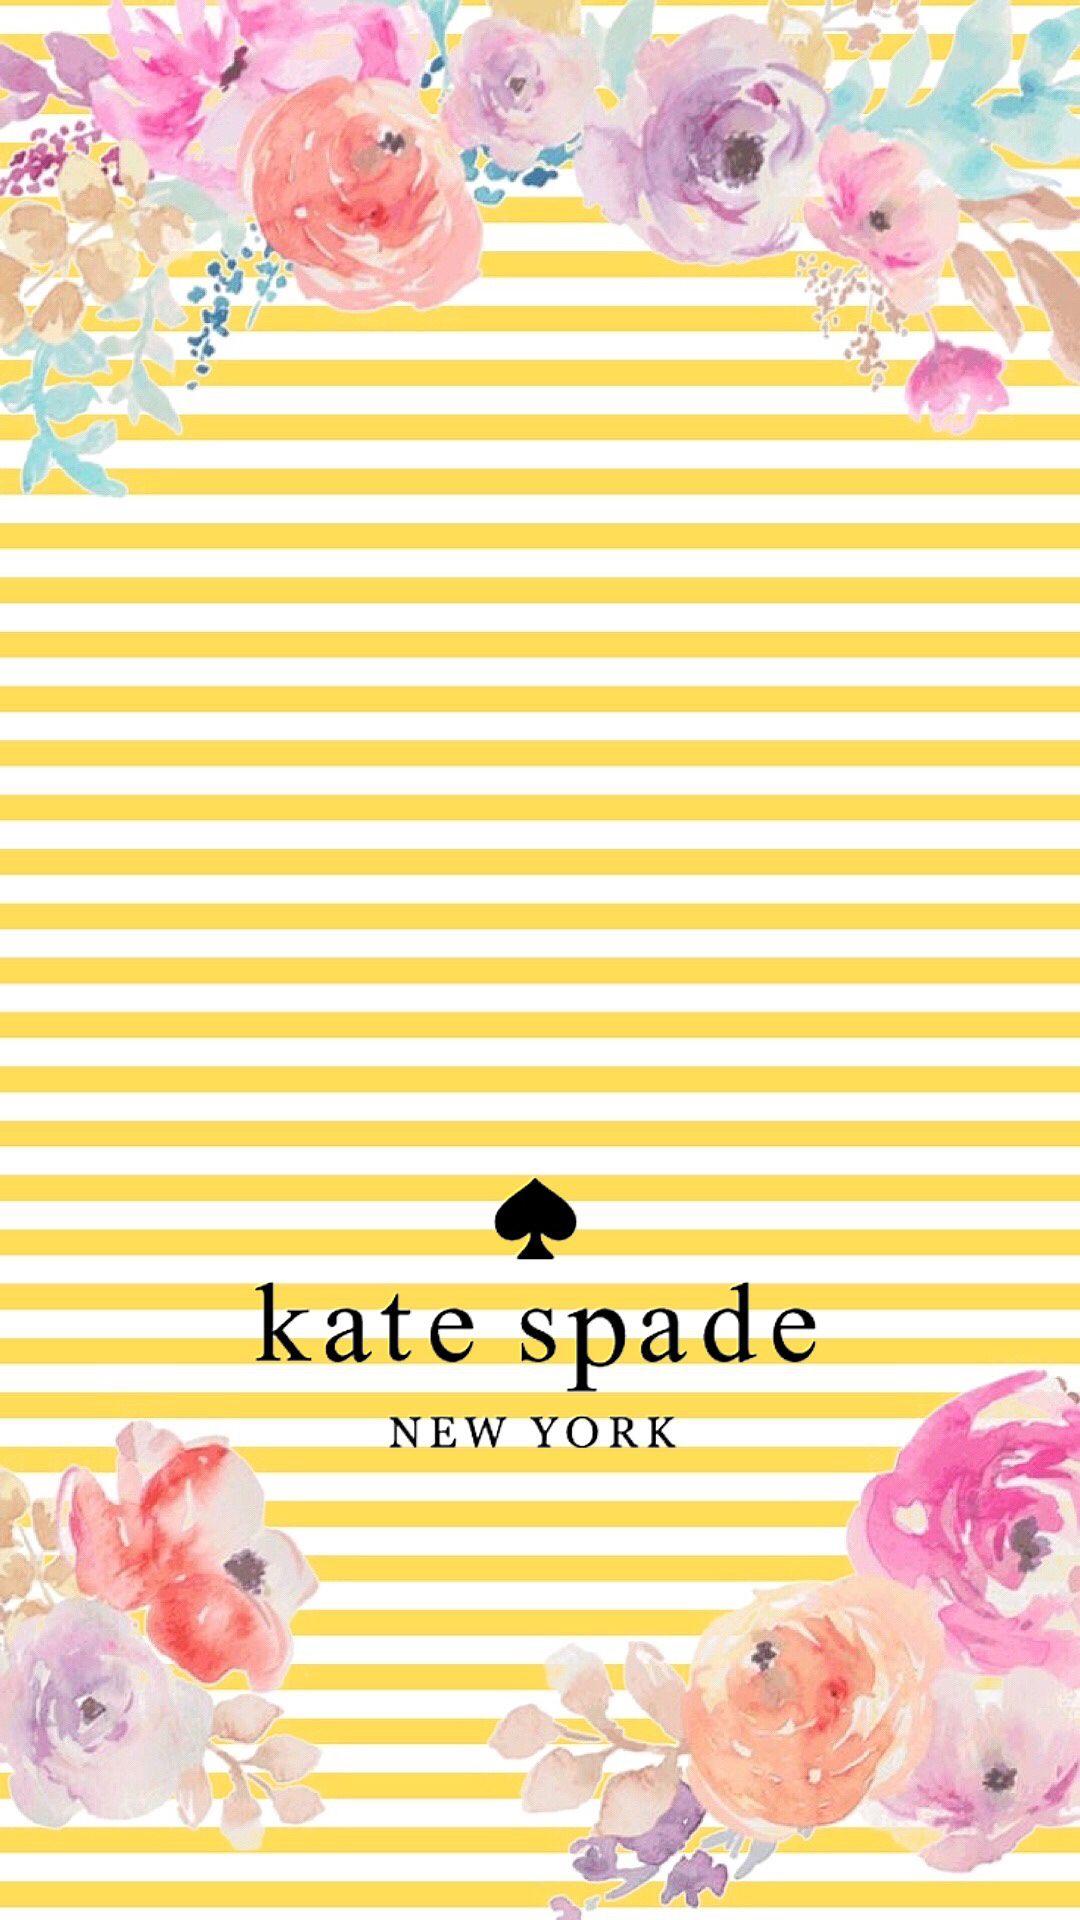 Reeseybelle Iphone Wallpaper Kate Spade Kate Spade Wallpaper Kate Spade Desktop Wallpaper